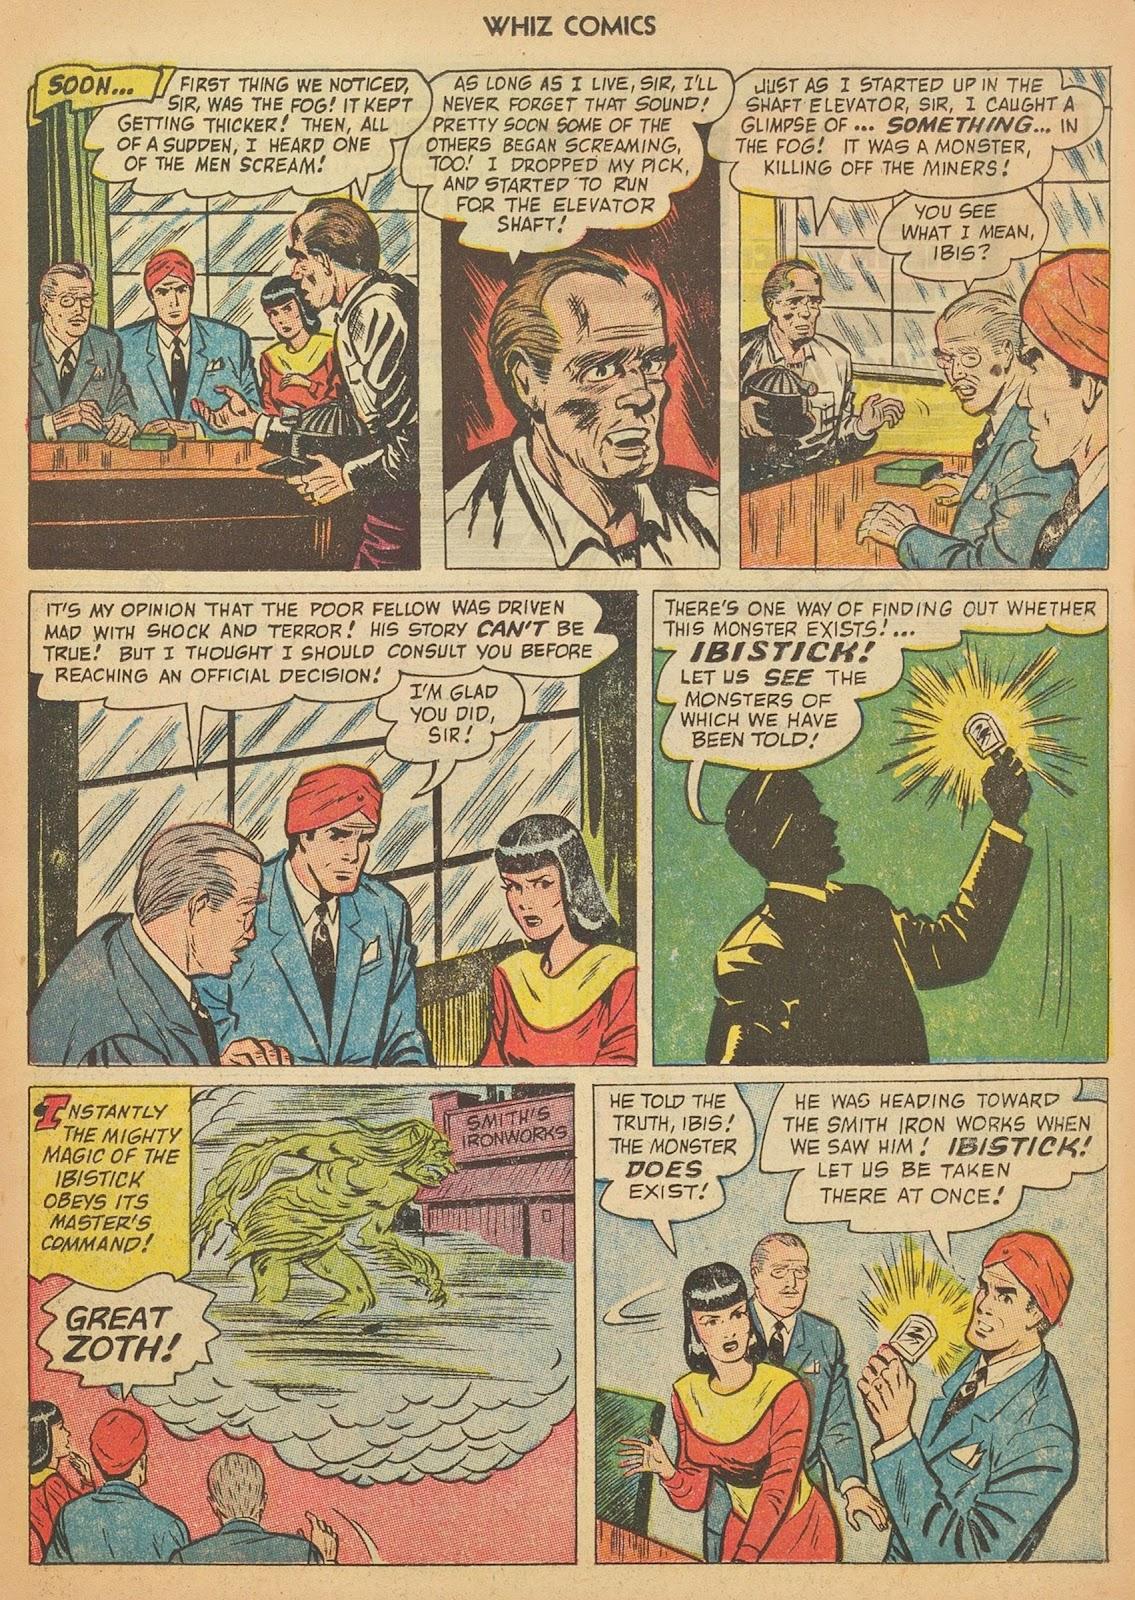 Read online WHIZ Comics comic -  Issue #153 - 11